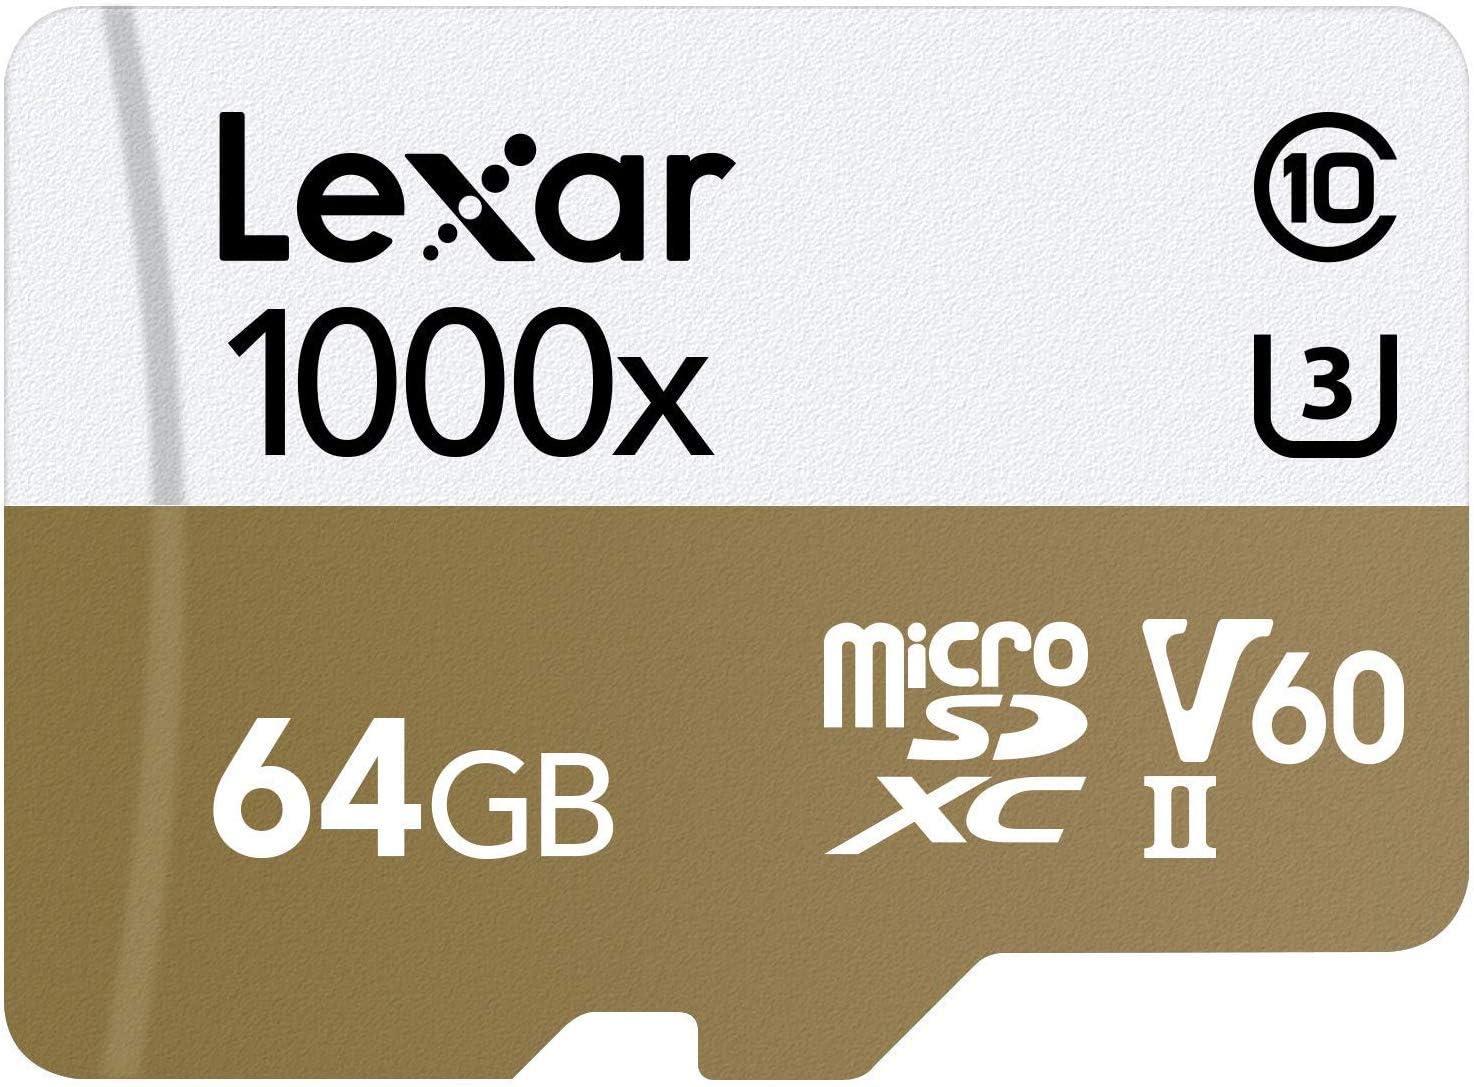 Lexar LSDMI64GCBNL1000R 64Go MicroSDXC UHS-II mémoire Flash - mémoires Flash (64 Go, MicroSDXC, UHS-II, 150 Mo/s, Multicolore)